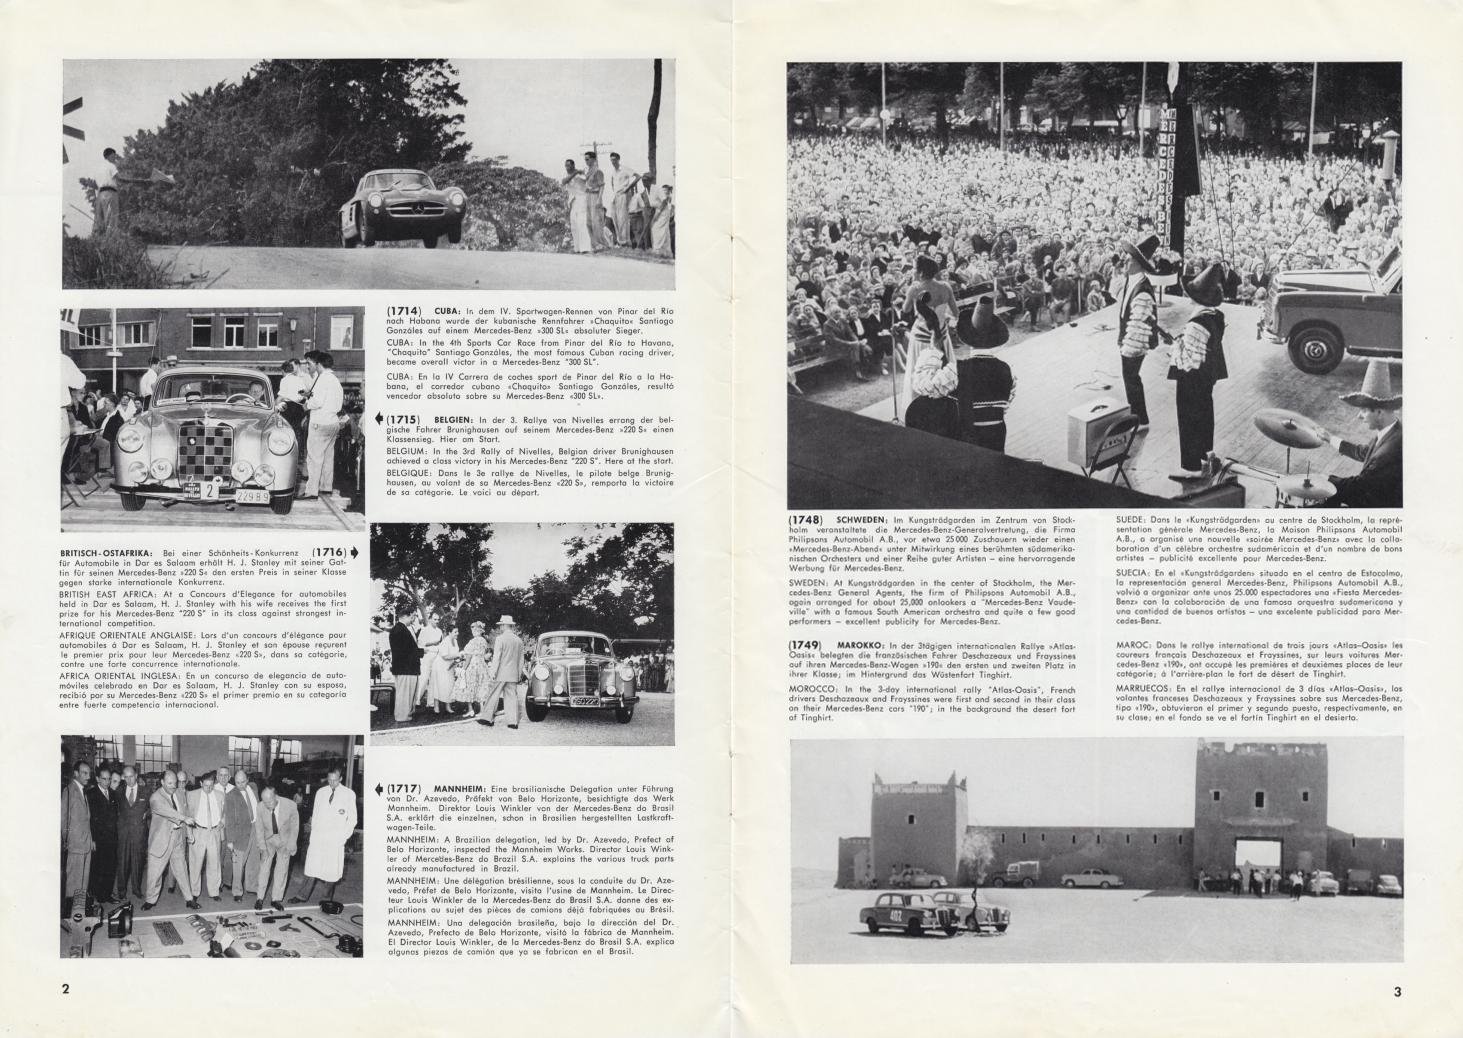 (REVISTA): Periódico In aller welt n.º 13 - Mercedes-Benz no mundo - 1957 - multilingue 002